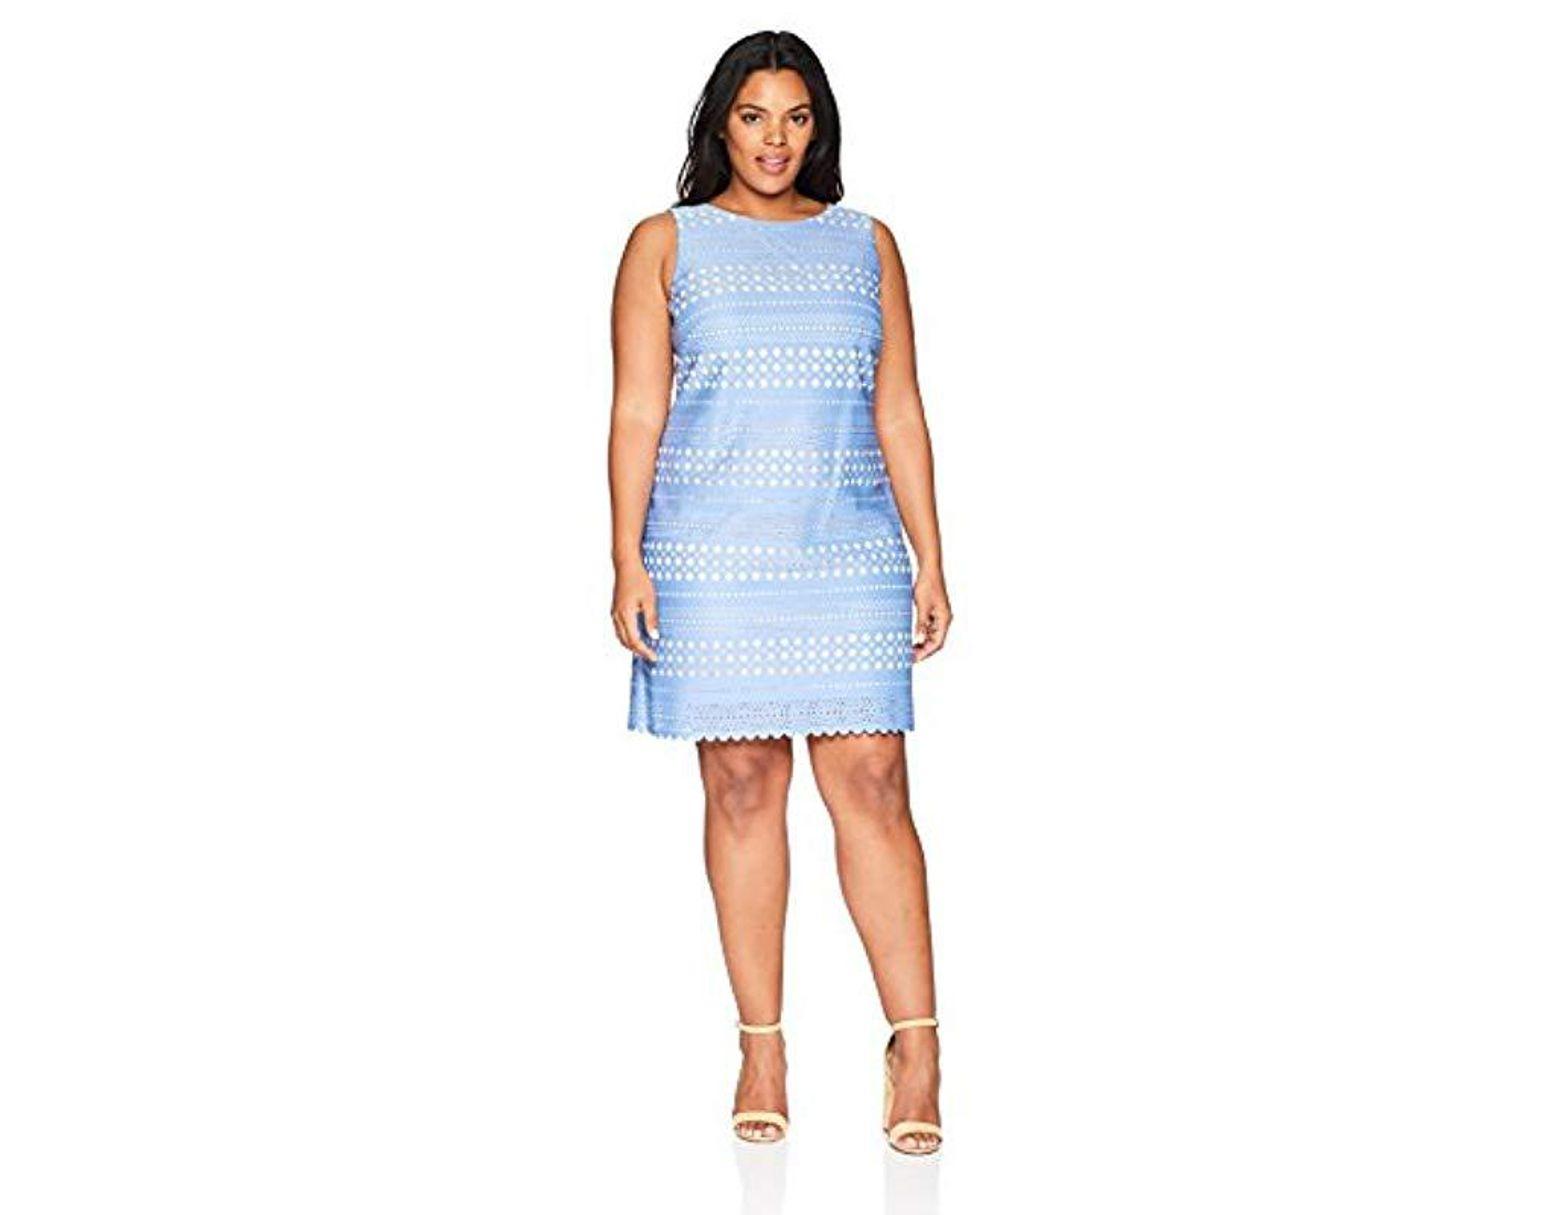 b19f5a99 Eliza J Plus Size Laser Cut Shift Dress in Blue - Save 7% - Lyst